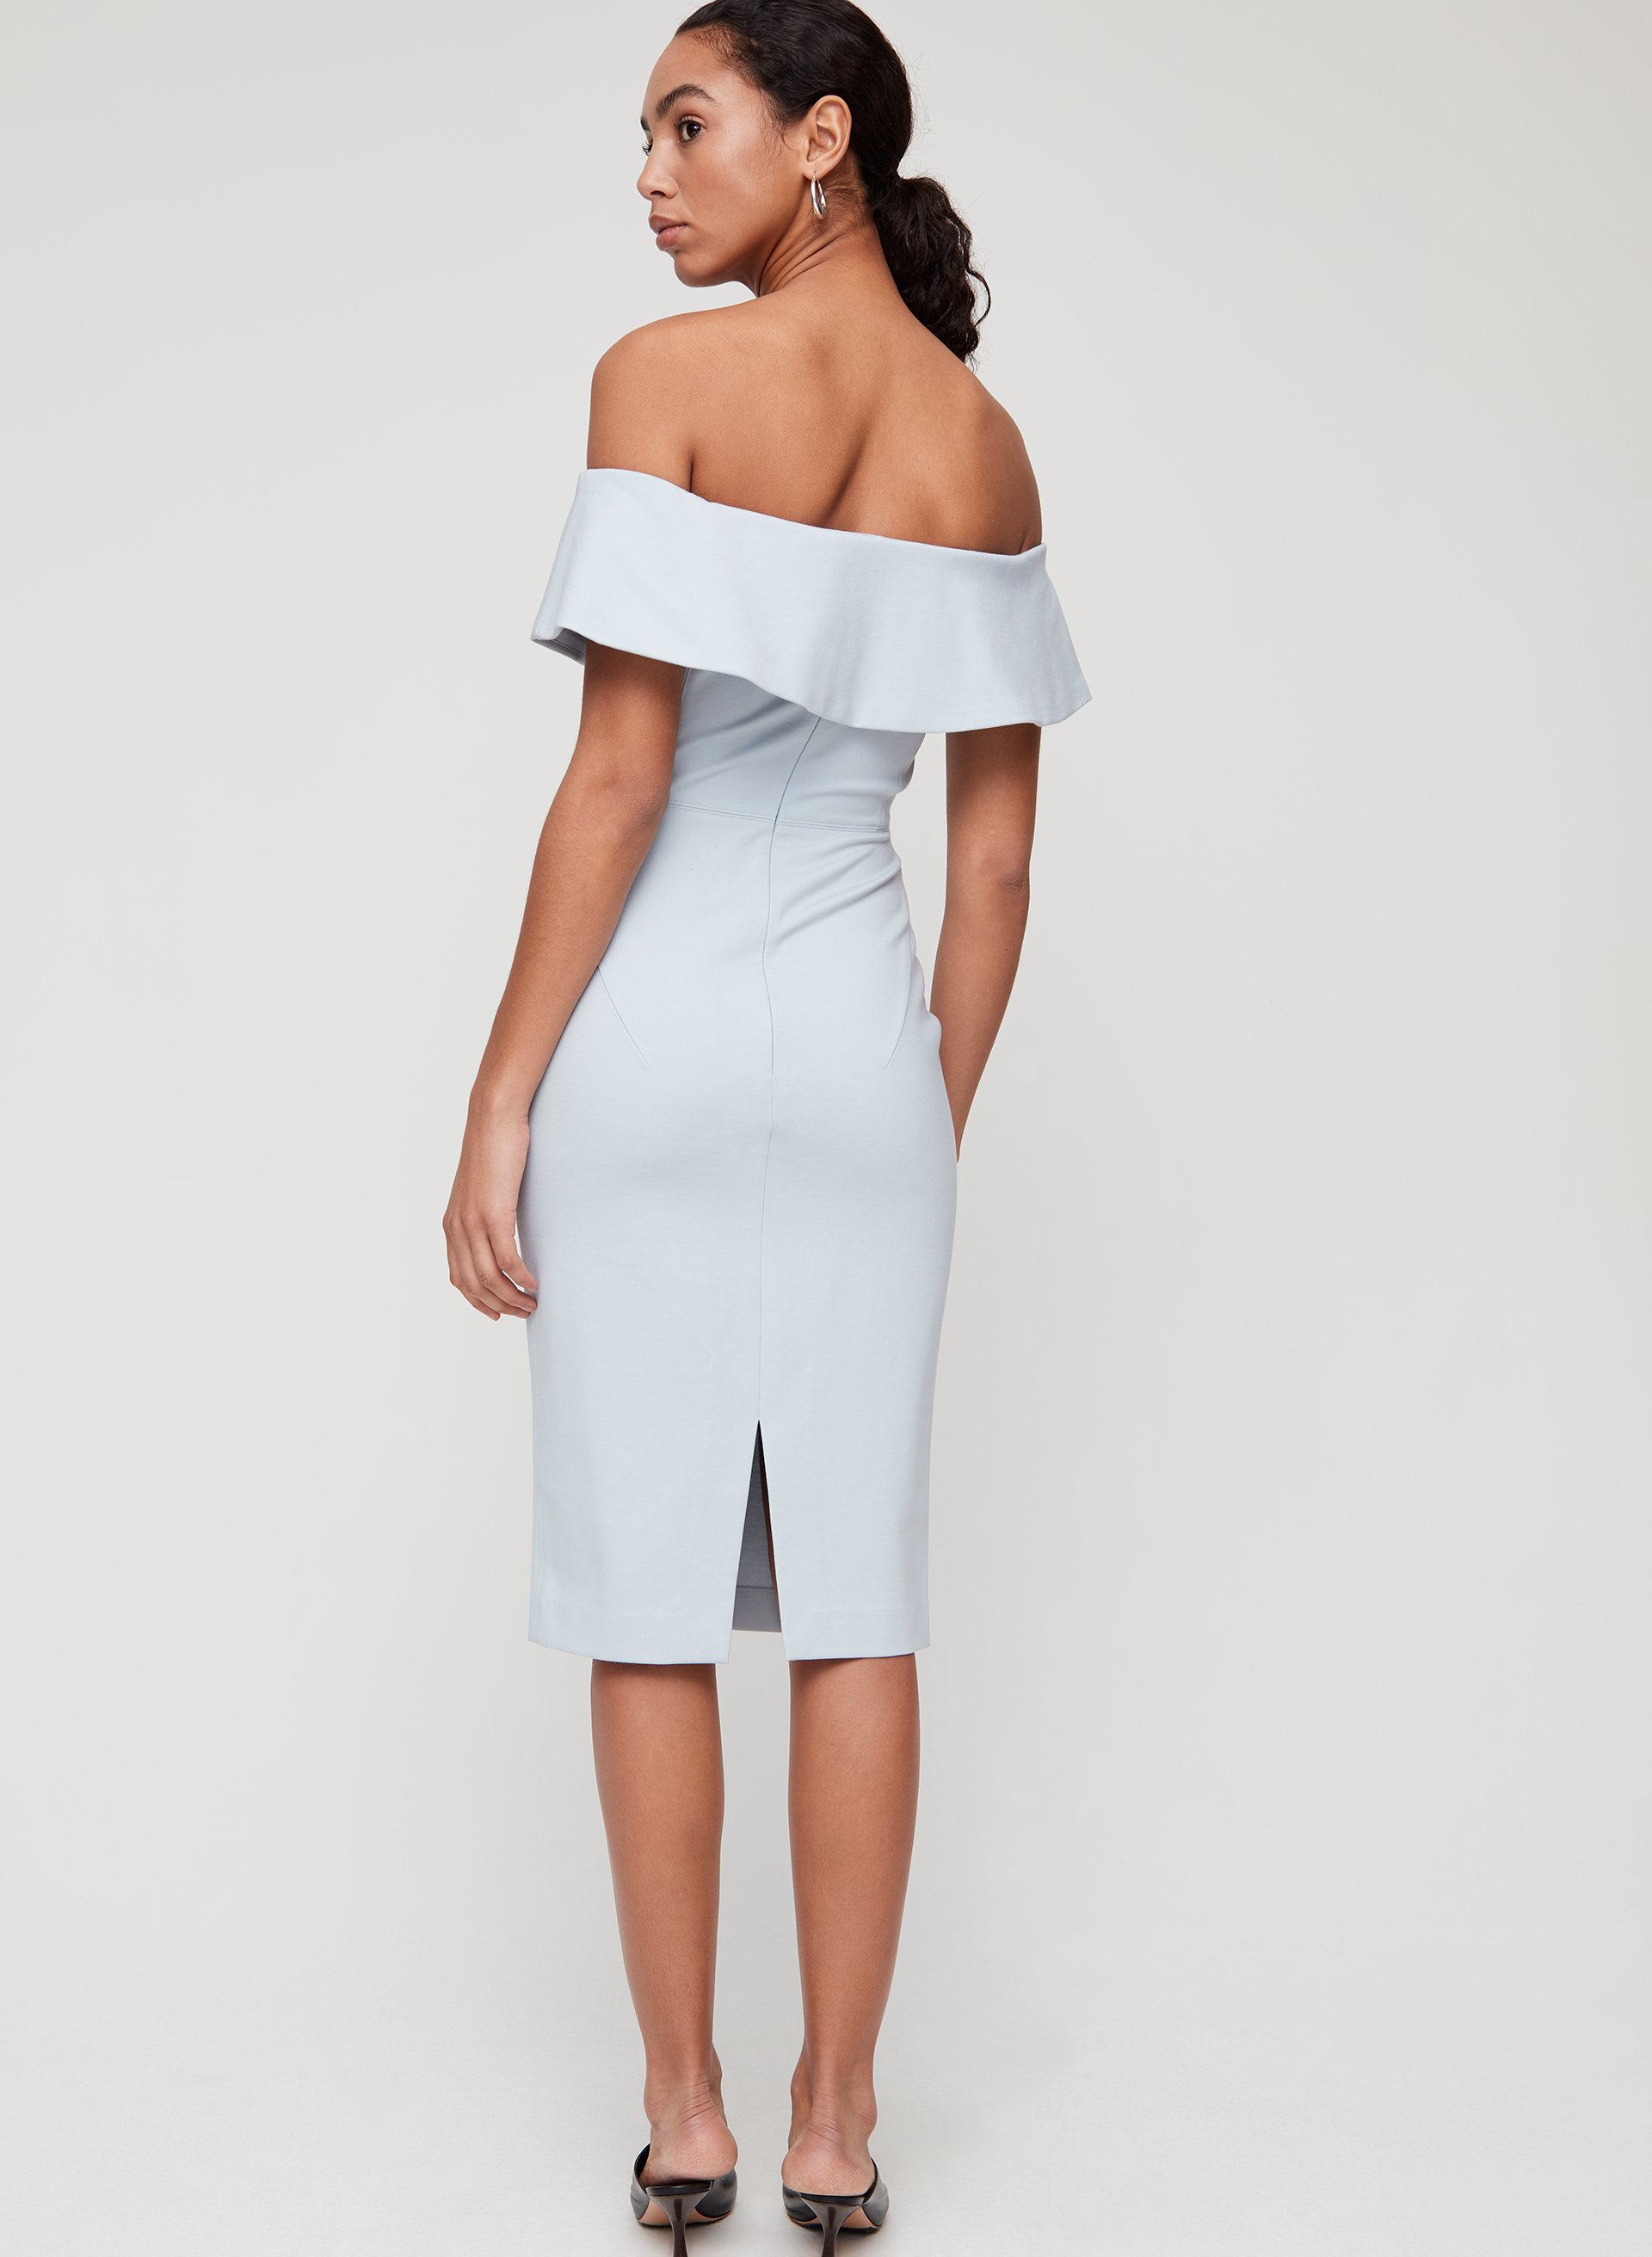 65caf2c3dd ruslan dress Off-the-shoulder midi dress